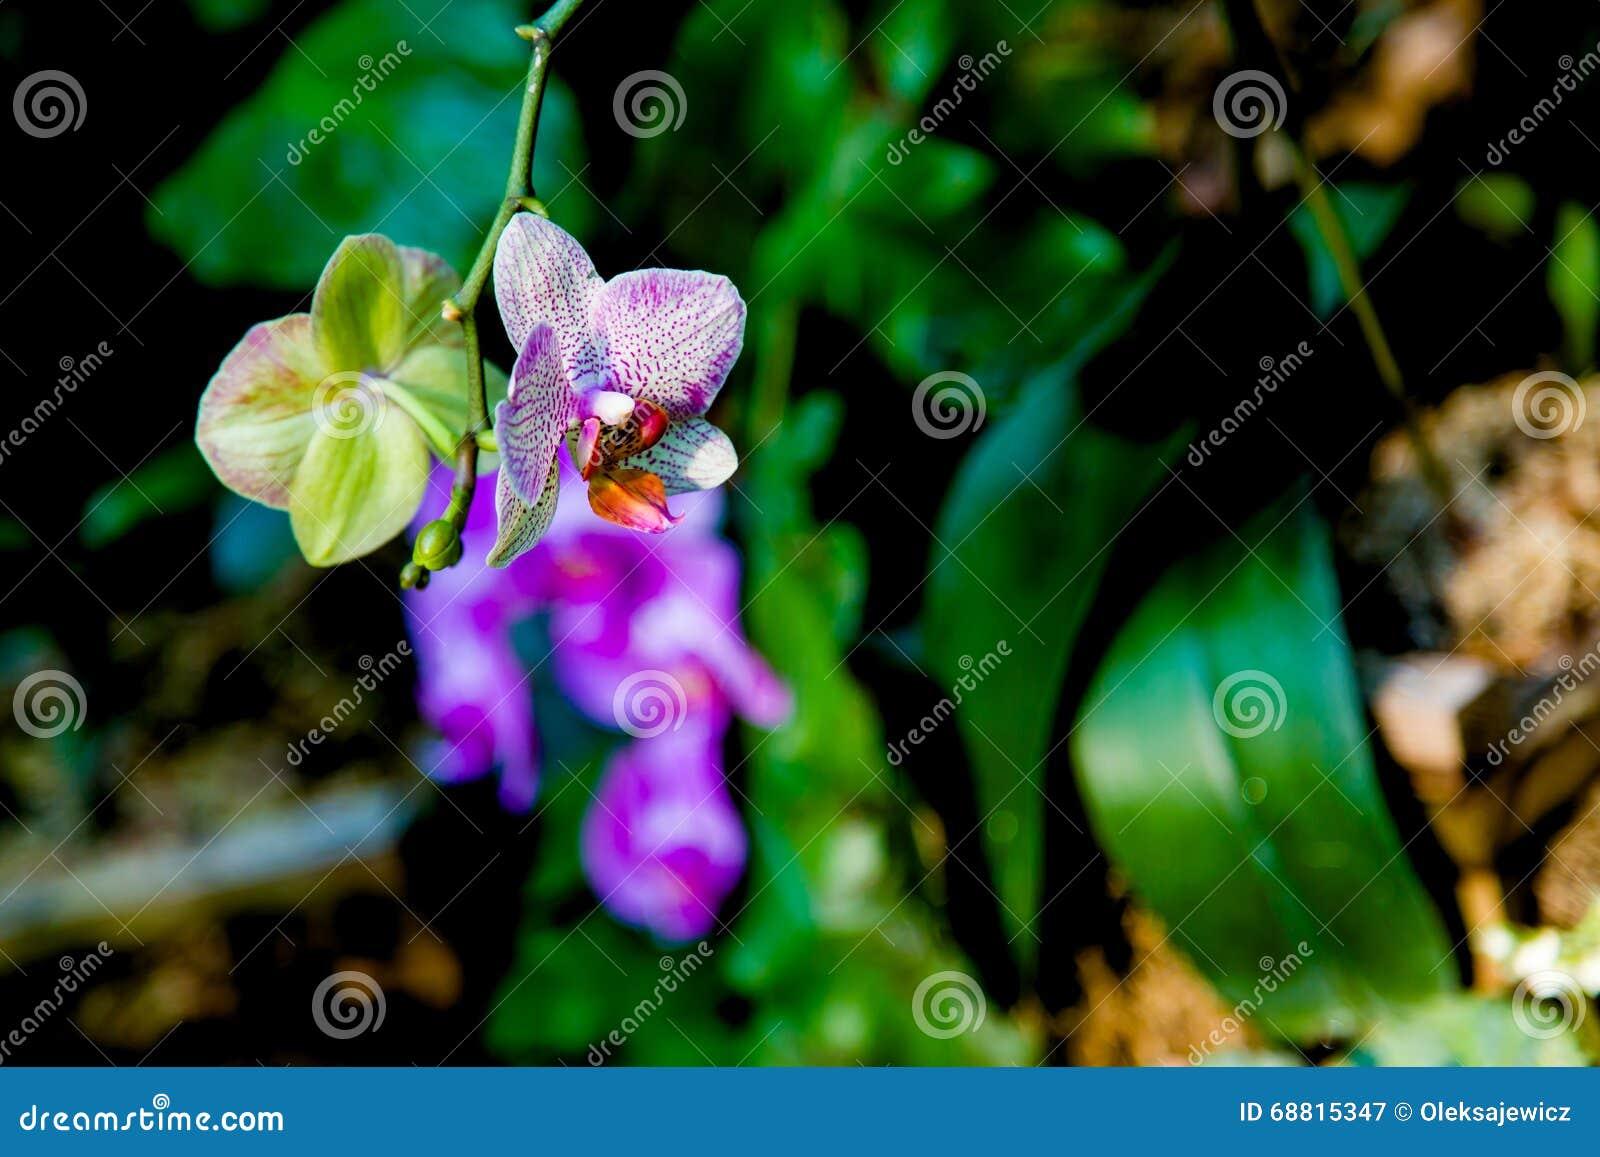 Beautiful exotic flowers in tropical jungle stock image image of beautiful exotic flowers in tropical jungle stock image image of leaves fertilizer 68815347 izmirmasajfo